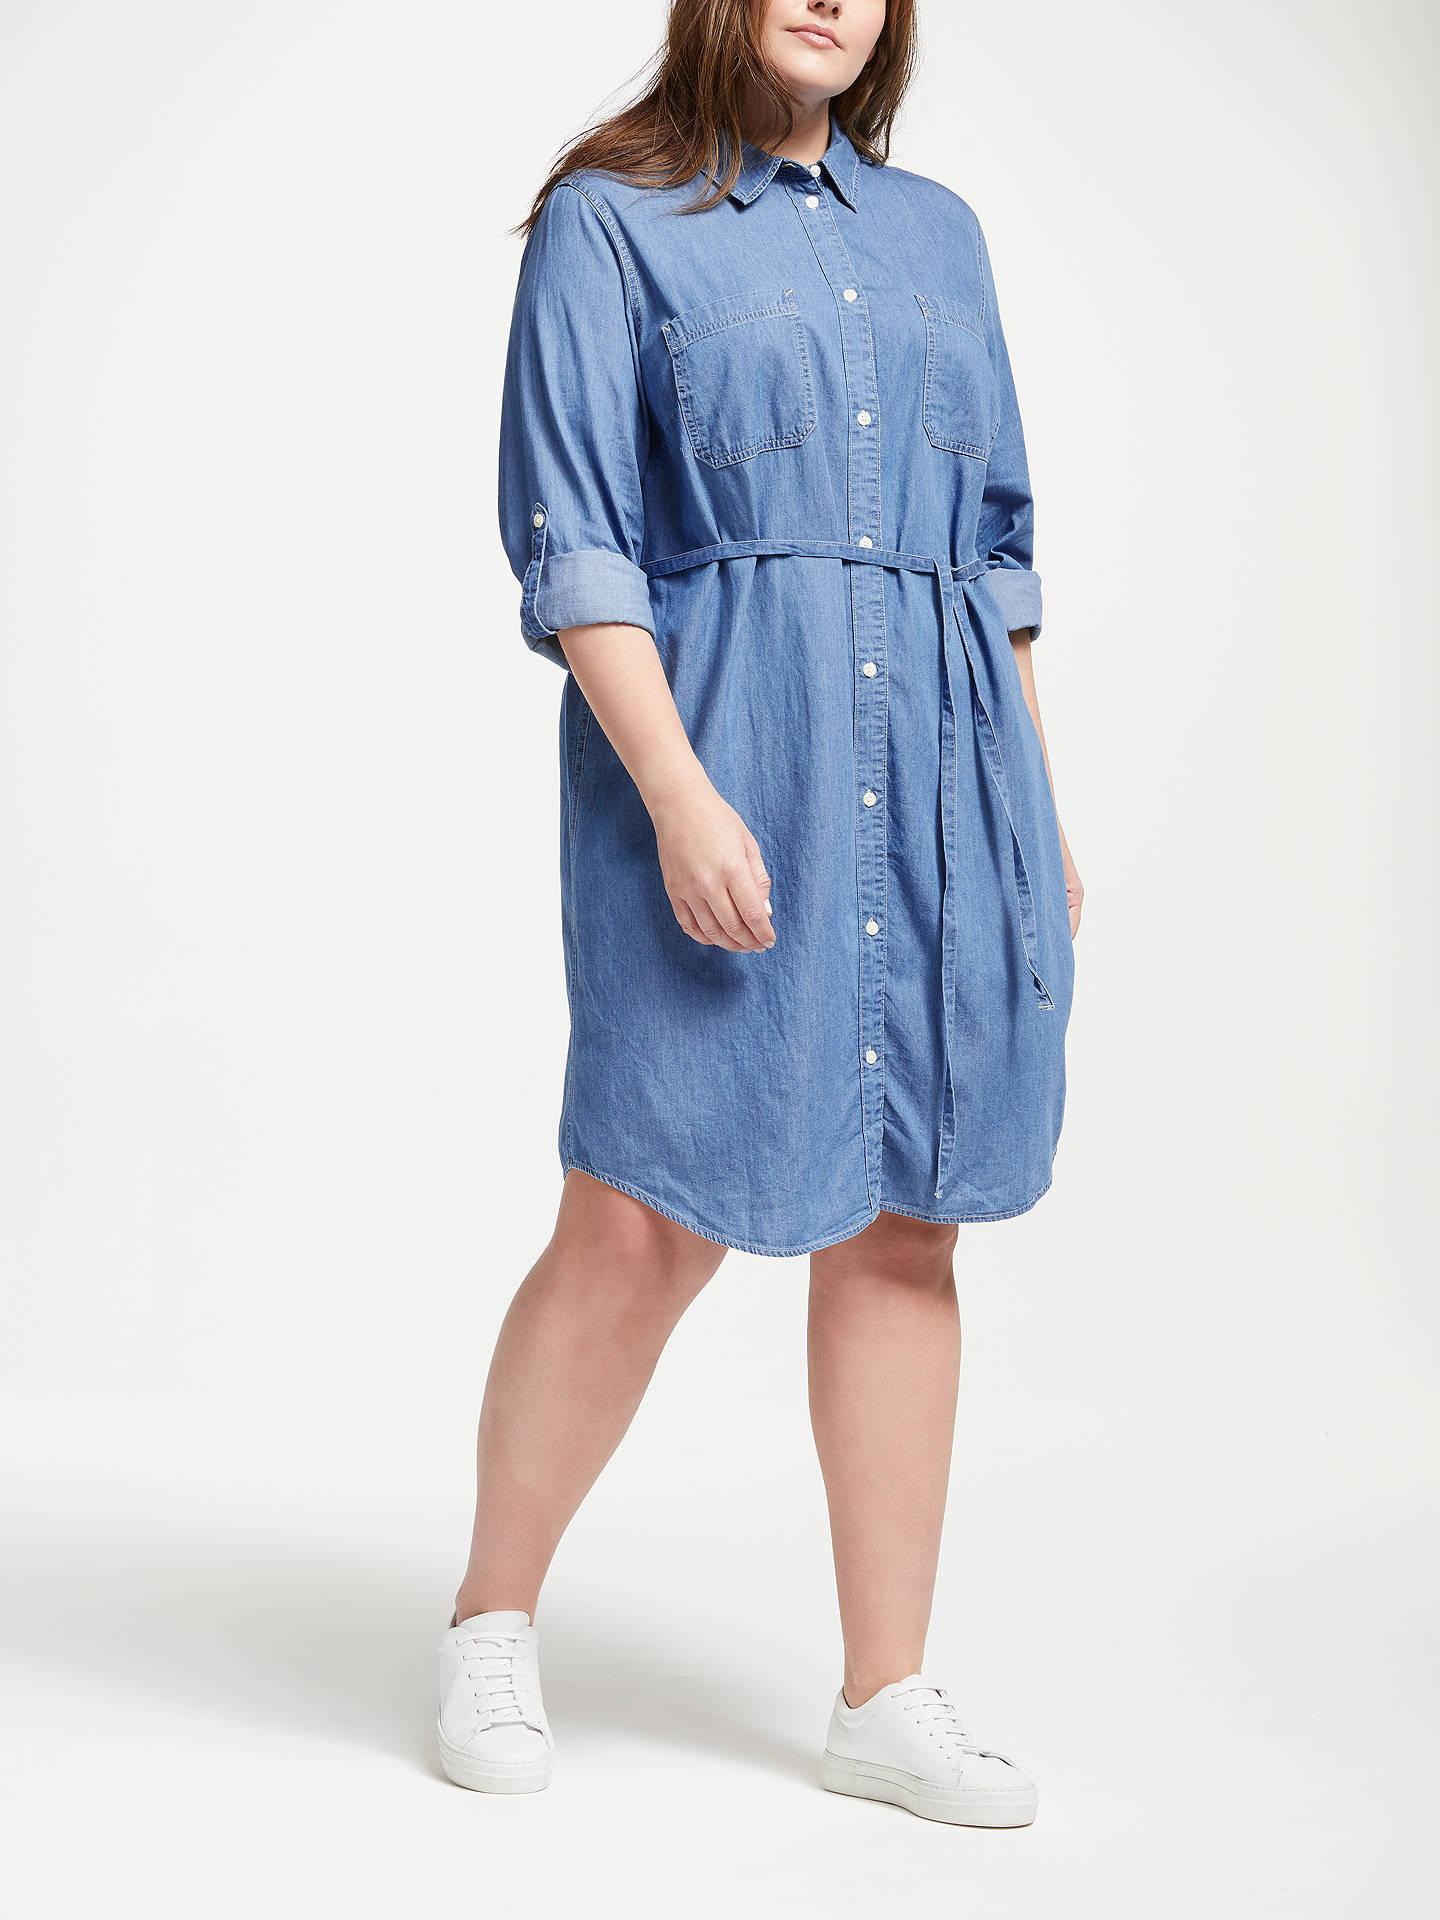 60f87ea2167 ... Buy Levi s Plus Bebe Denim Dress